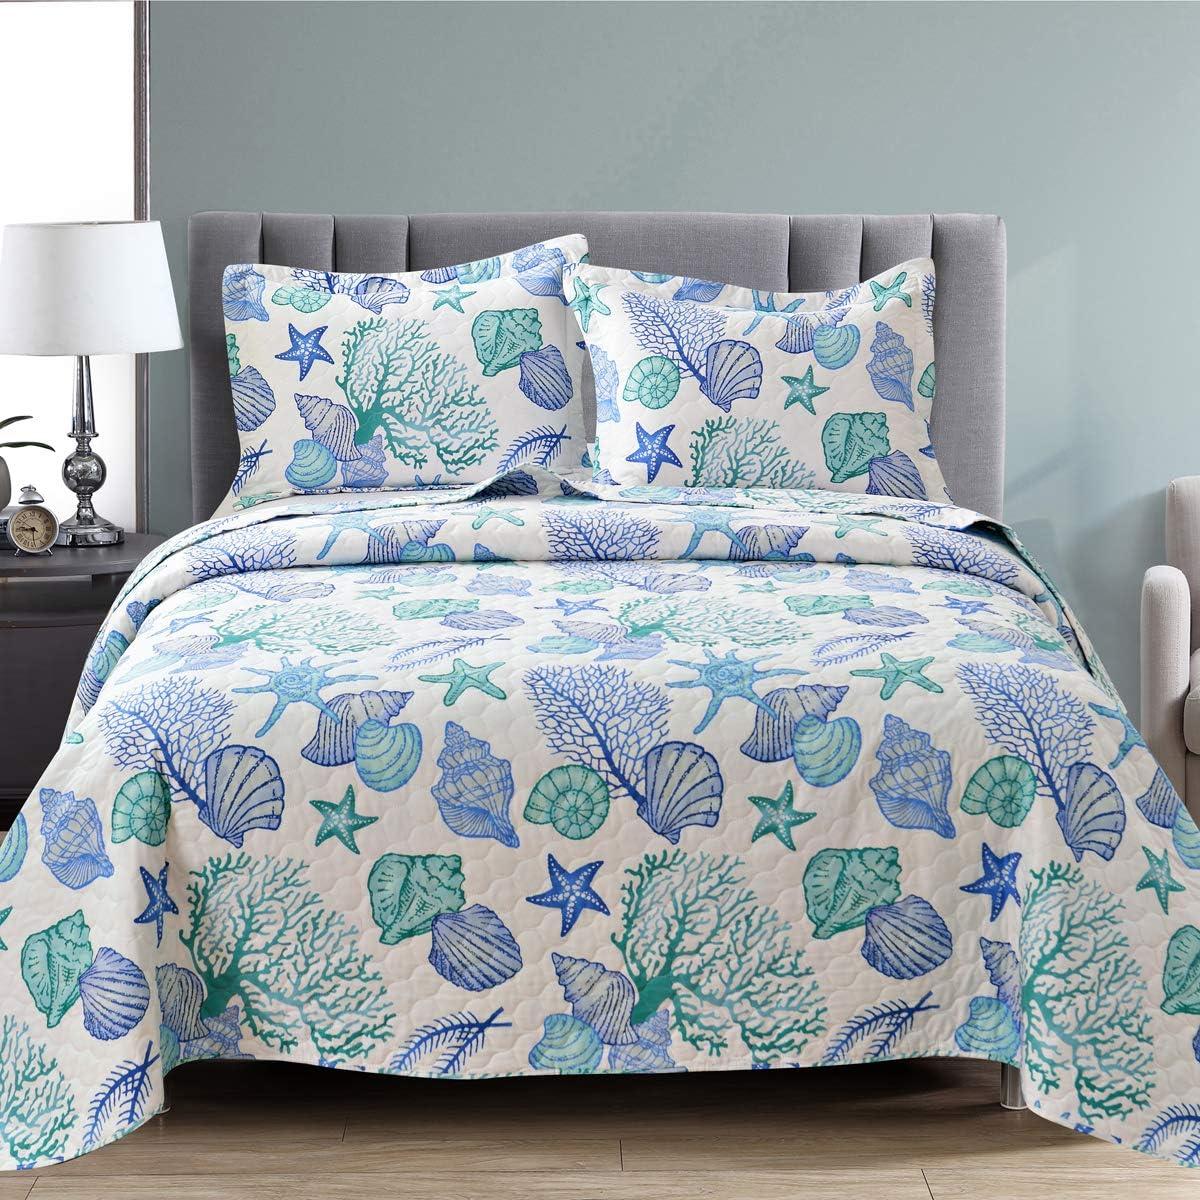 3Pcs Lightweight Beach Bedspreads Sale SALE% OFF Ocean Bedding Reservation Reversible Pillo